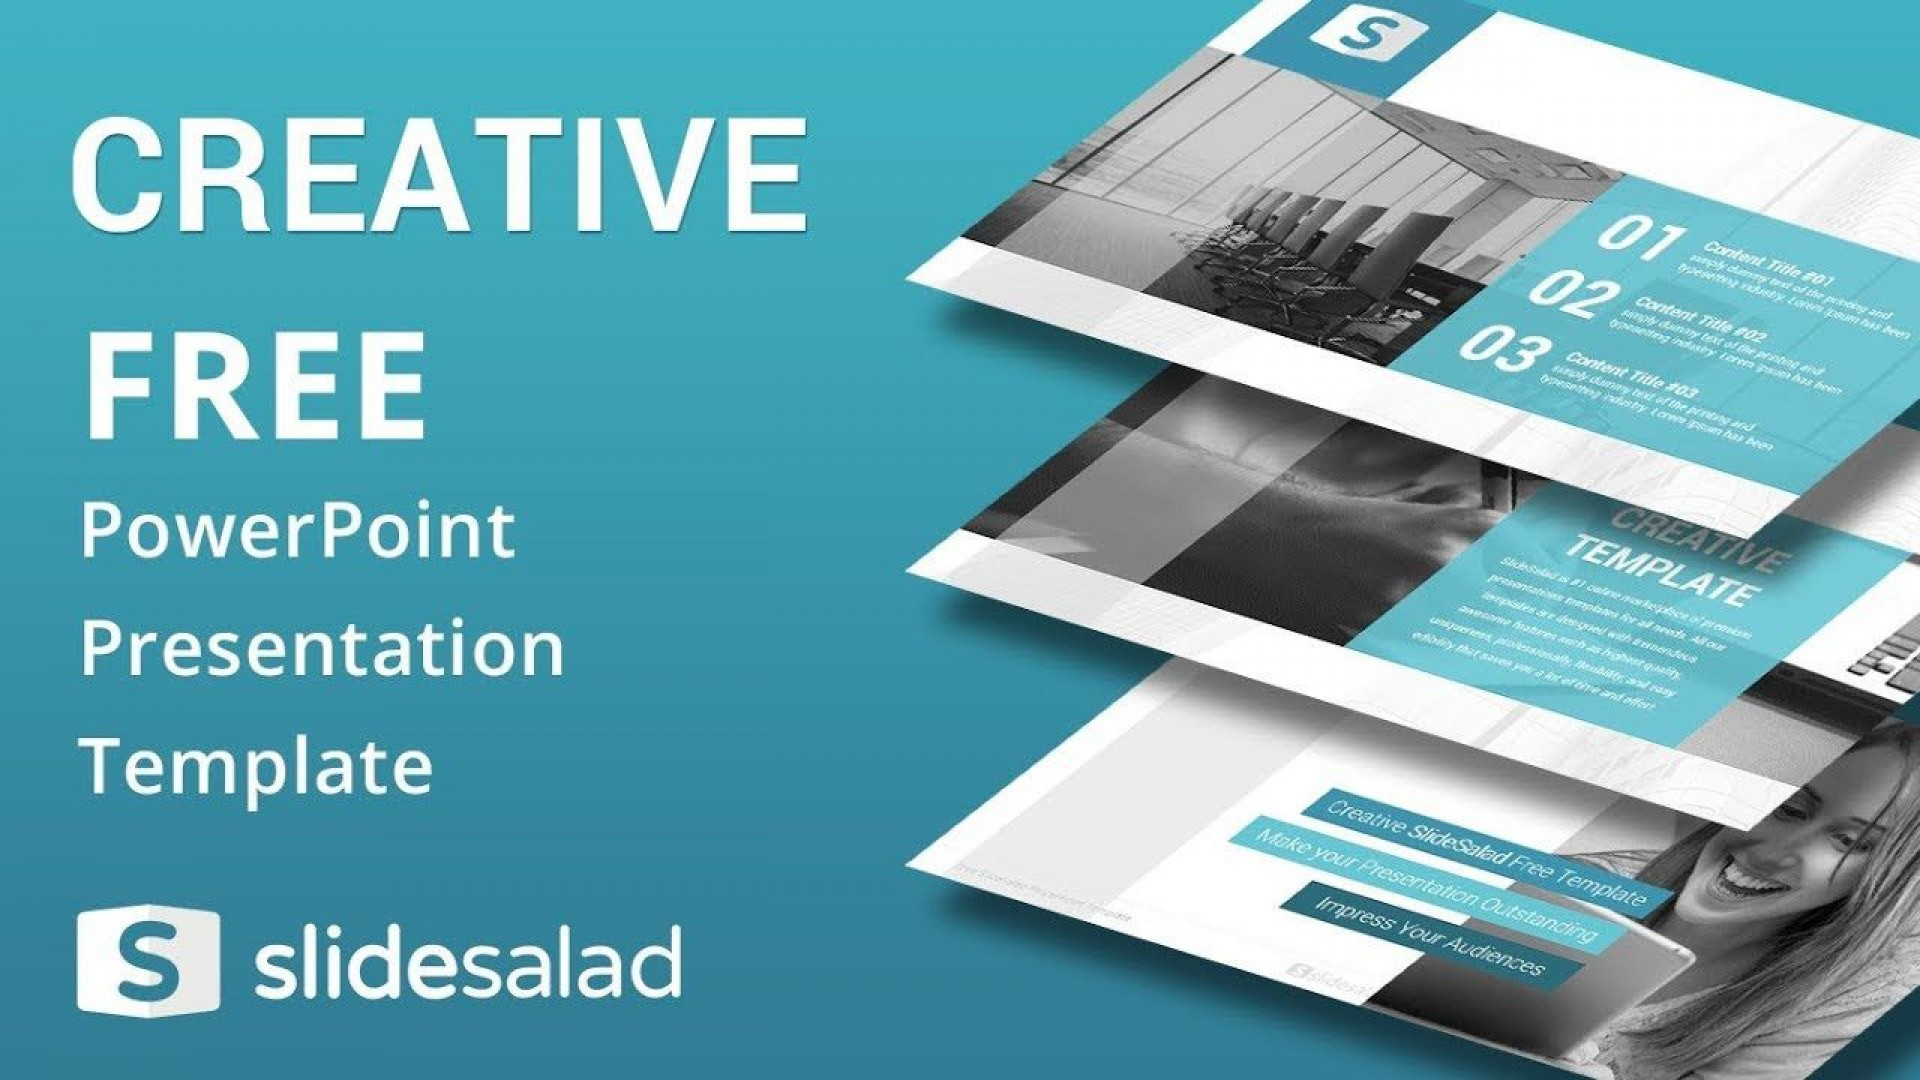 007 Wondrou Ppt Slide Design Template Free Download High Definition  One Resume Team Introduction Powerpoint Presentation1920